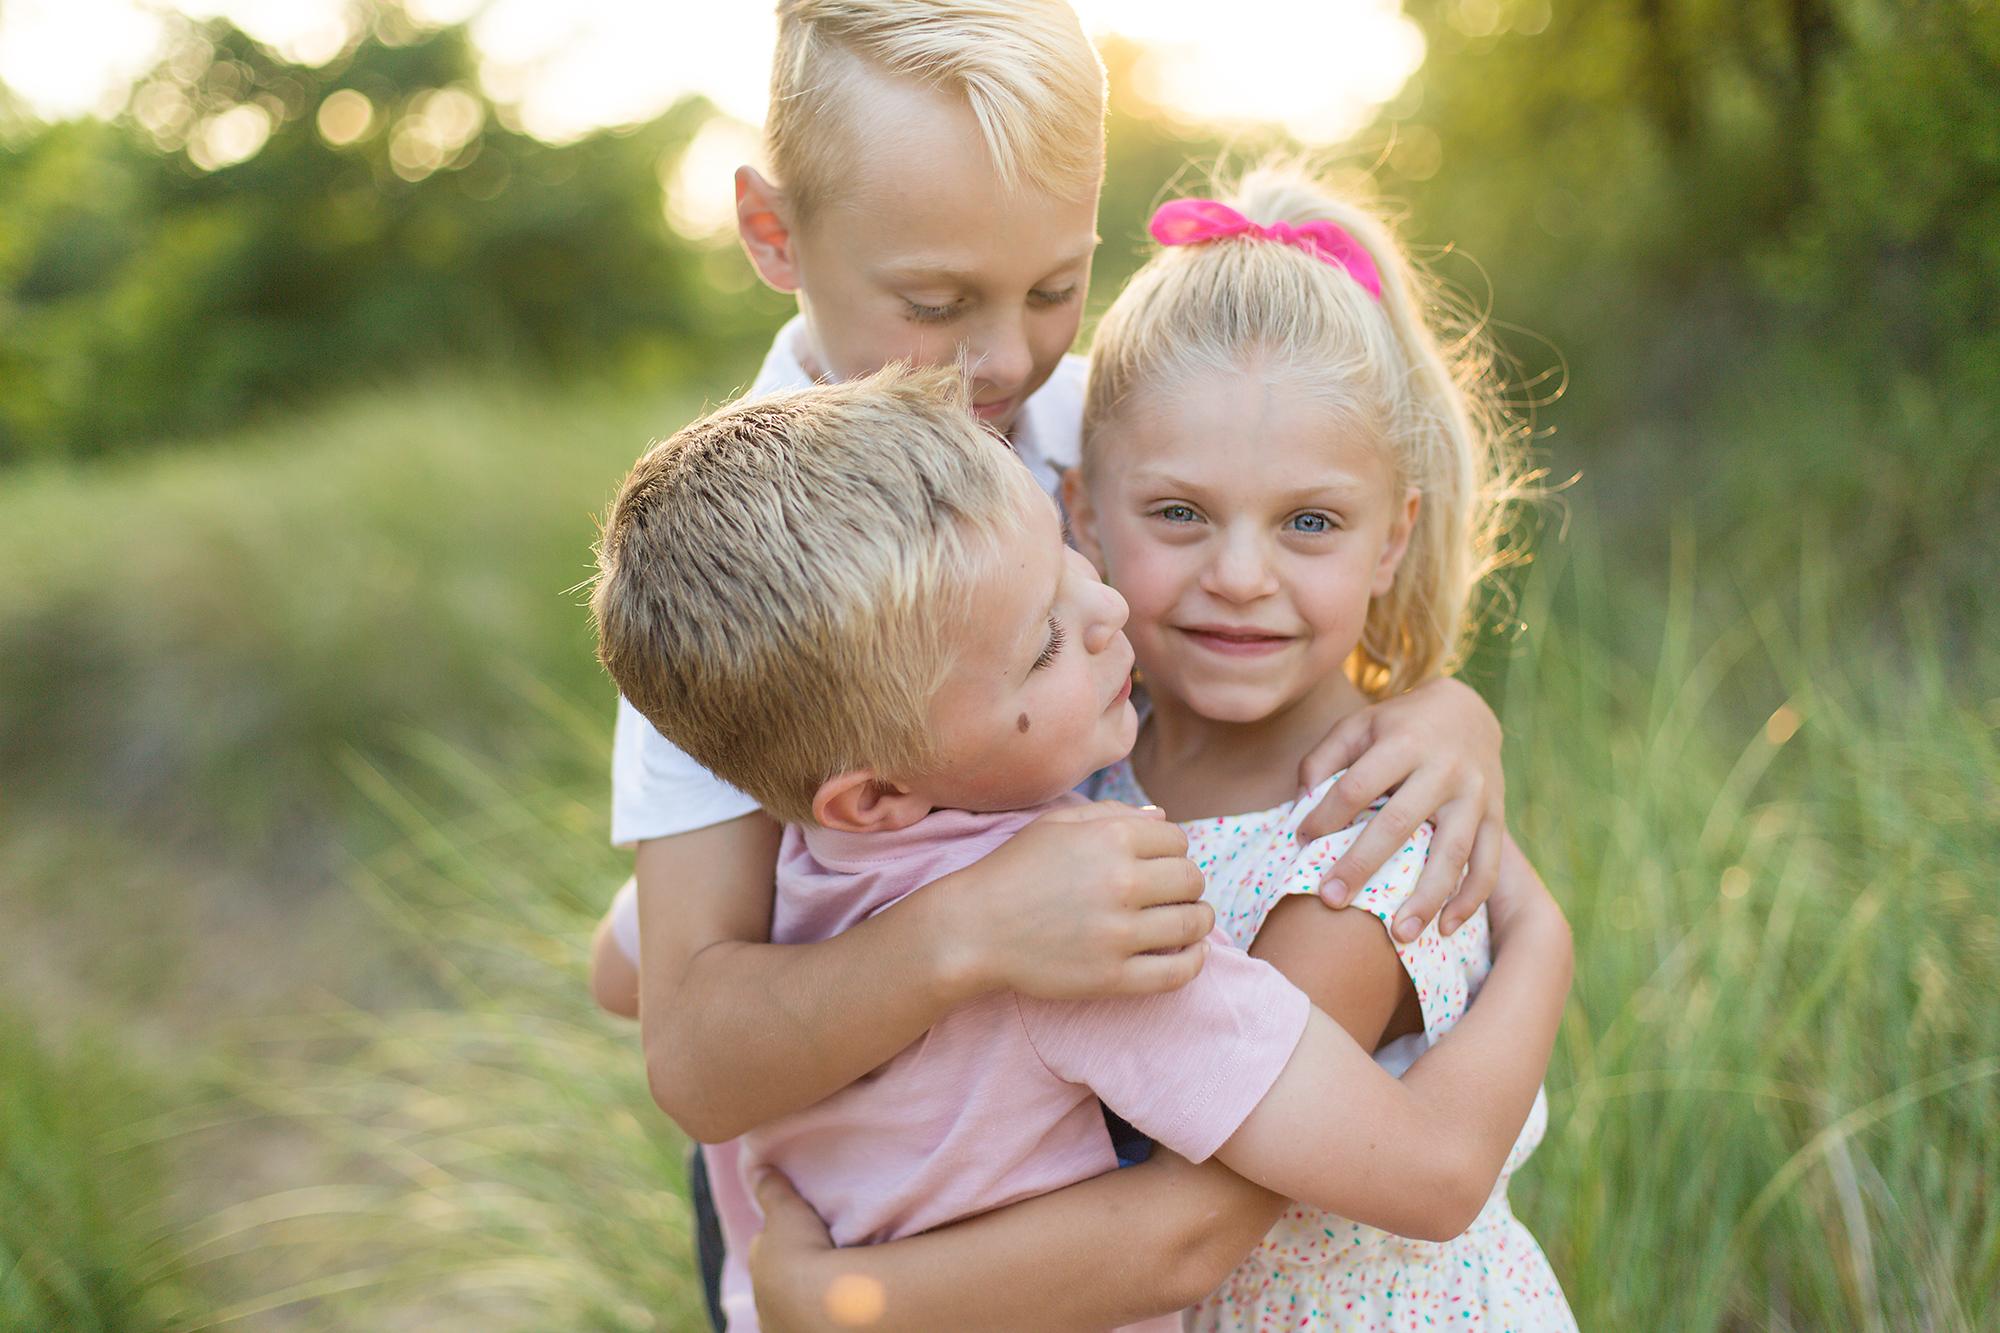 bethany-brinkworth-photography-sibling-hug.jpg